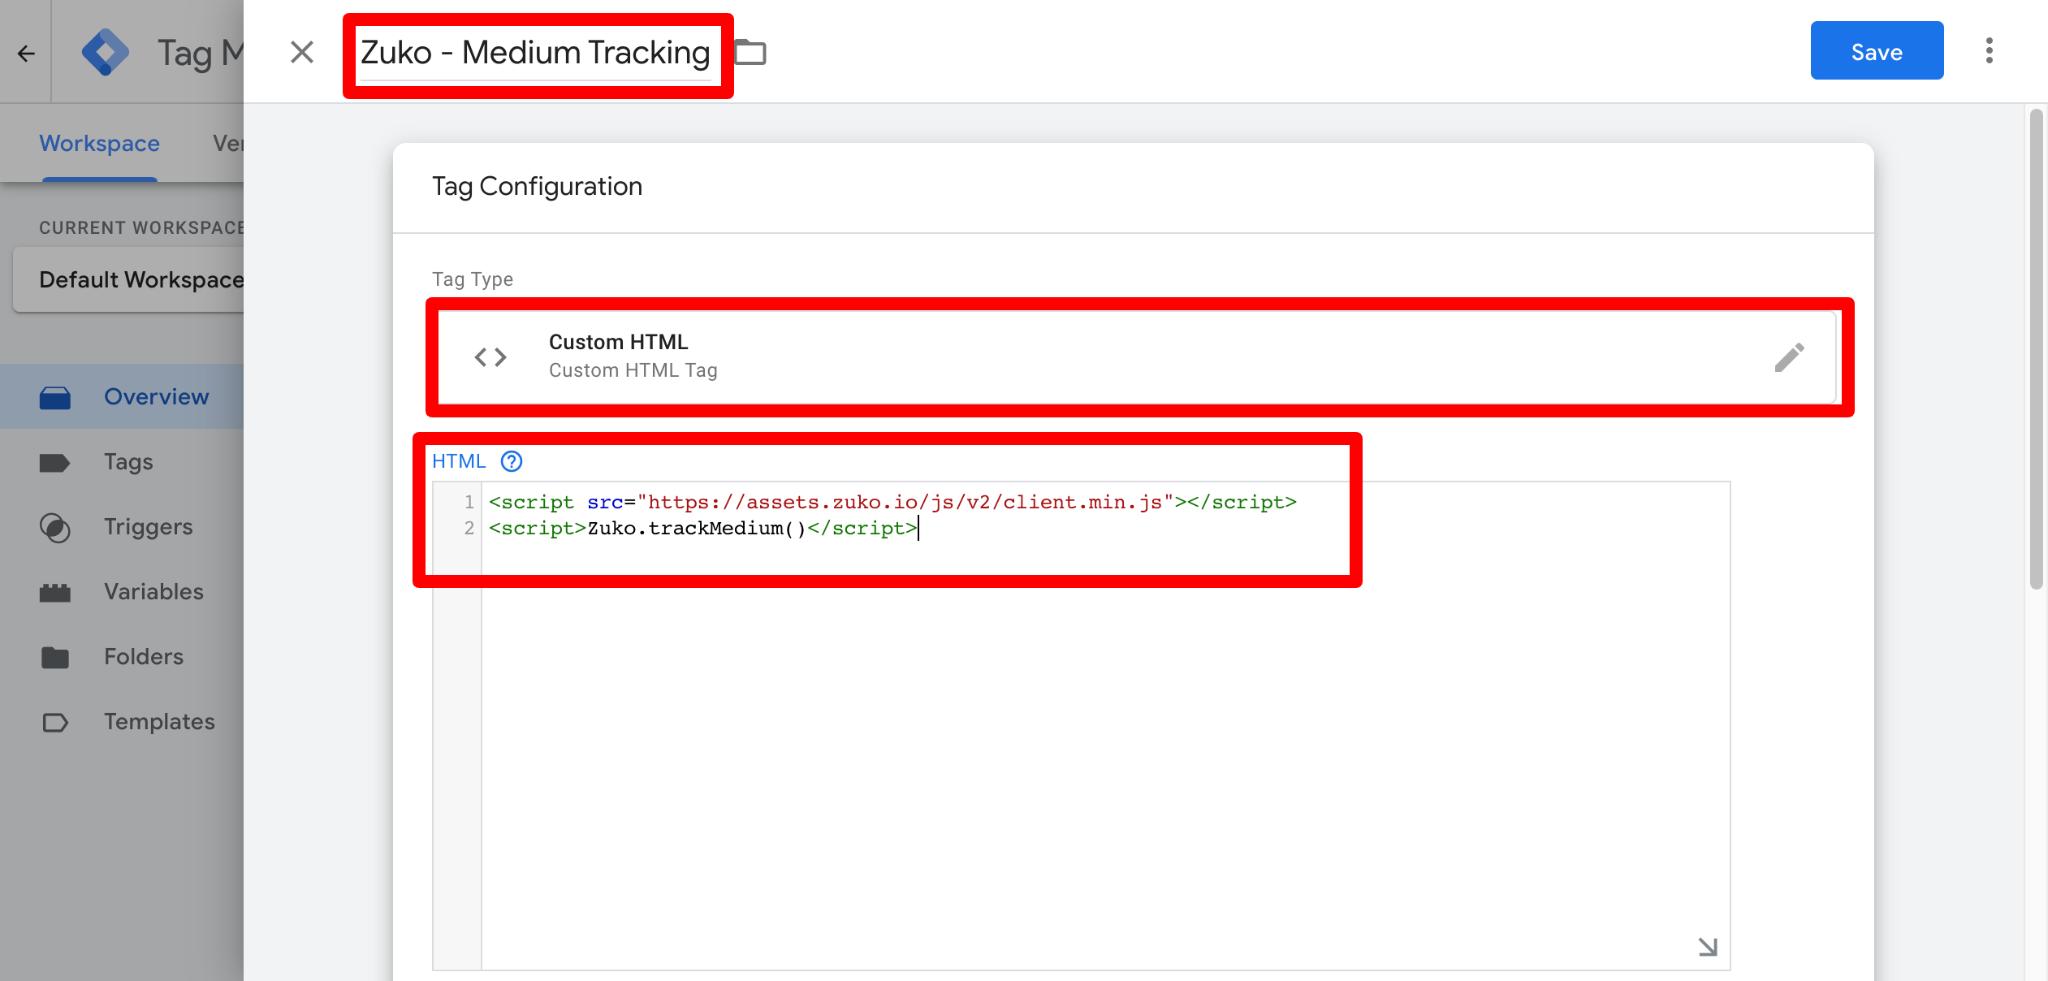 Screenshot of Zuko Medium Tracking Tag in GTM